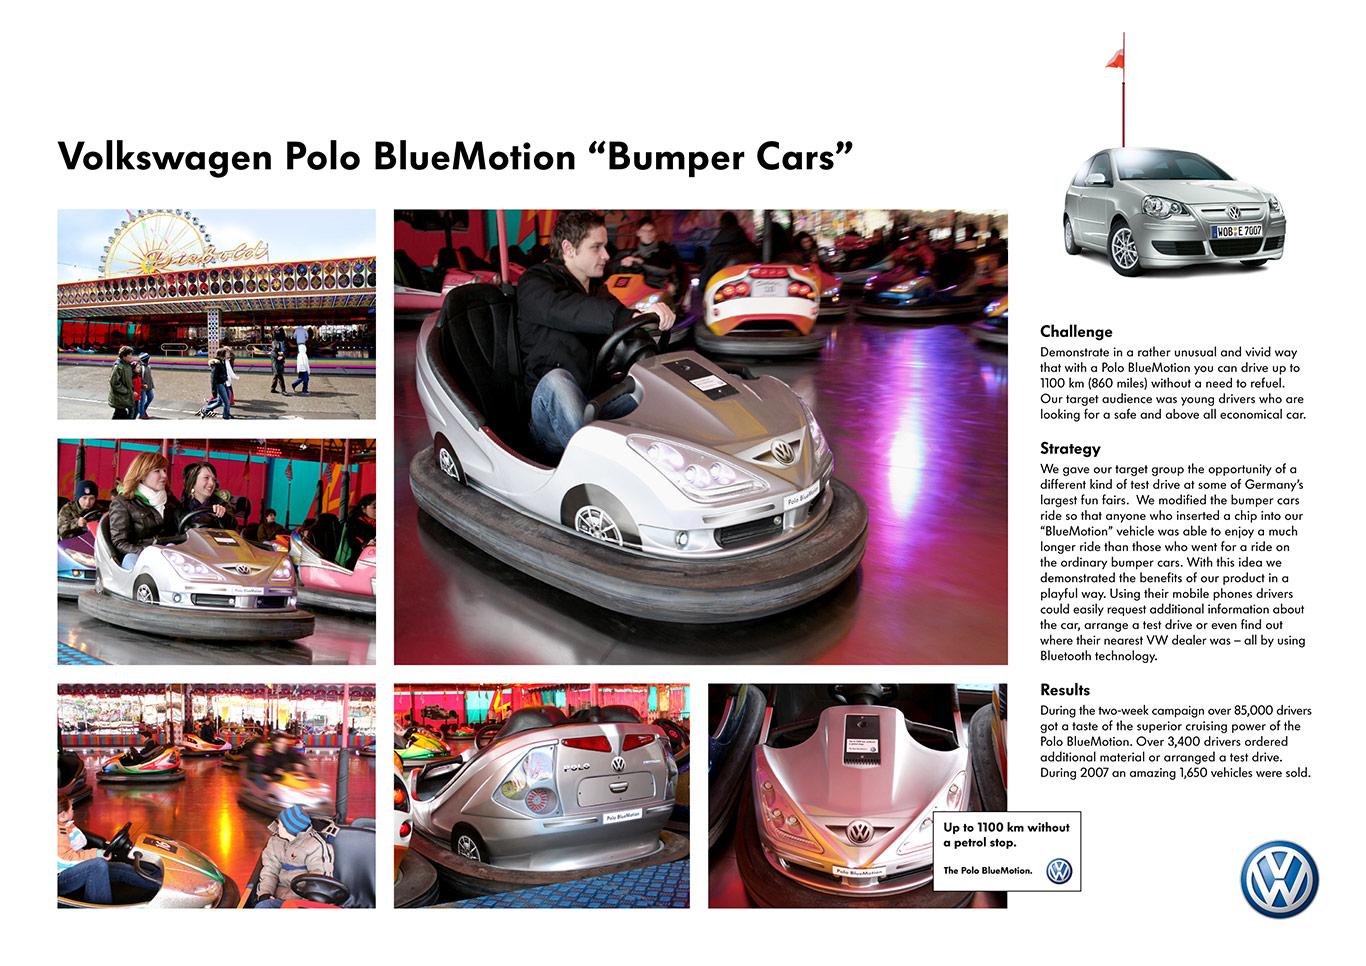 2-Volkswagen-Polo-BlueMotion-Bumper-Cars-Board